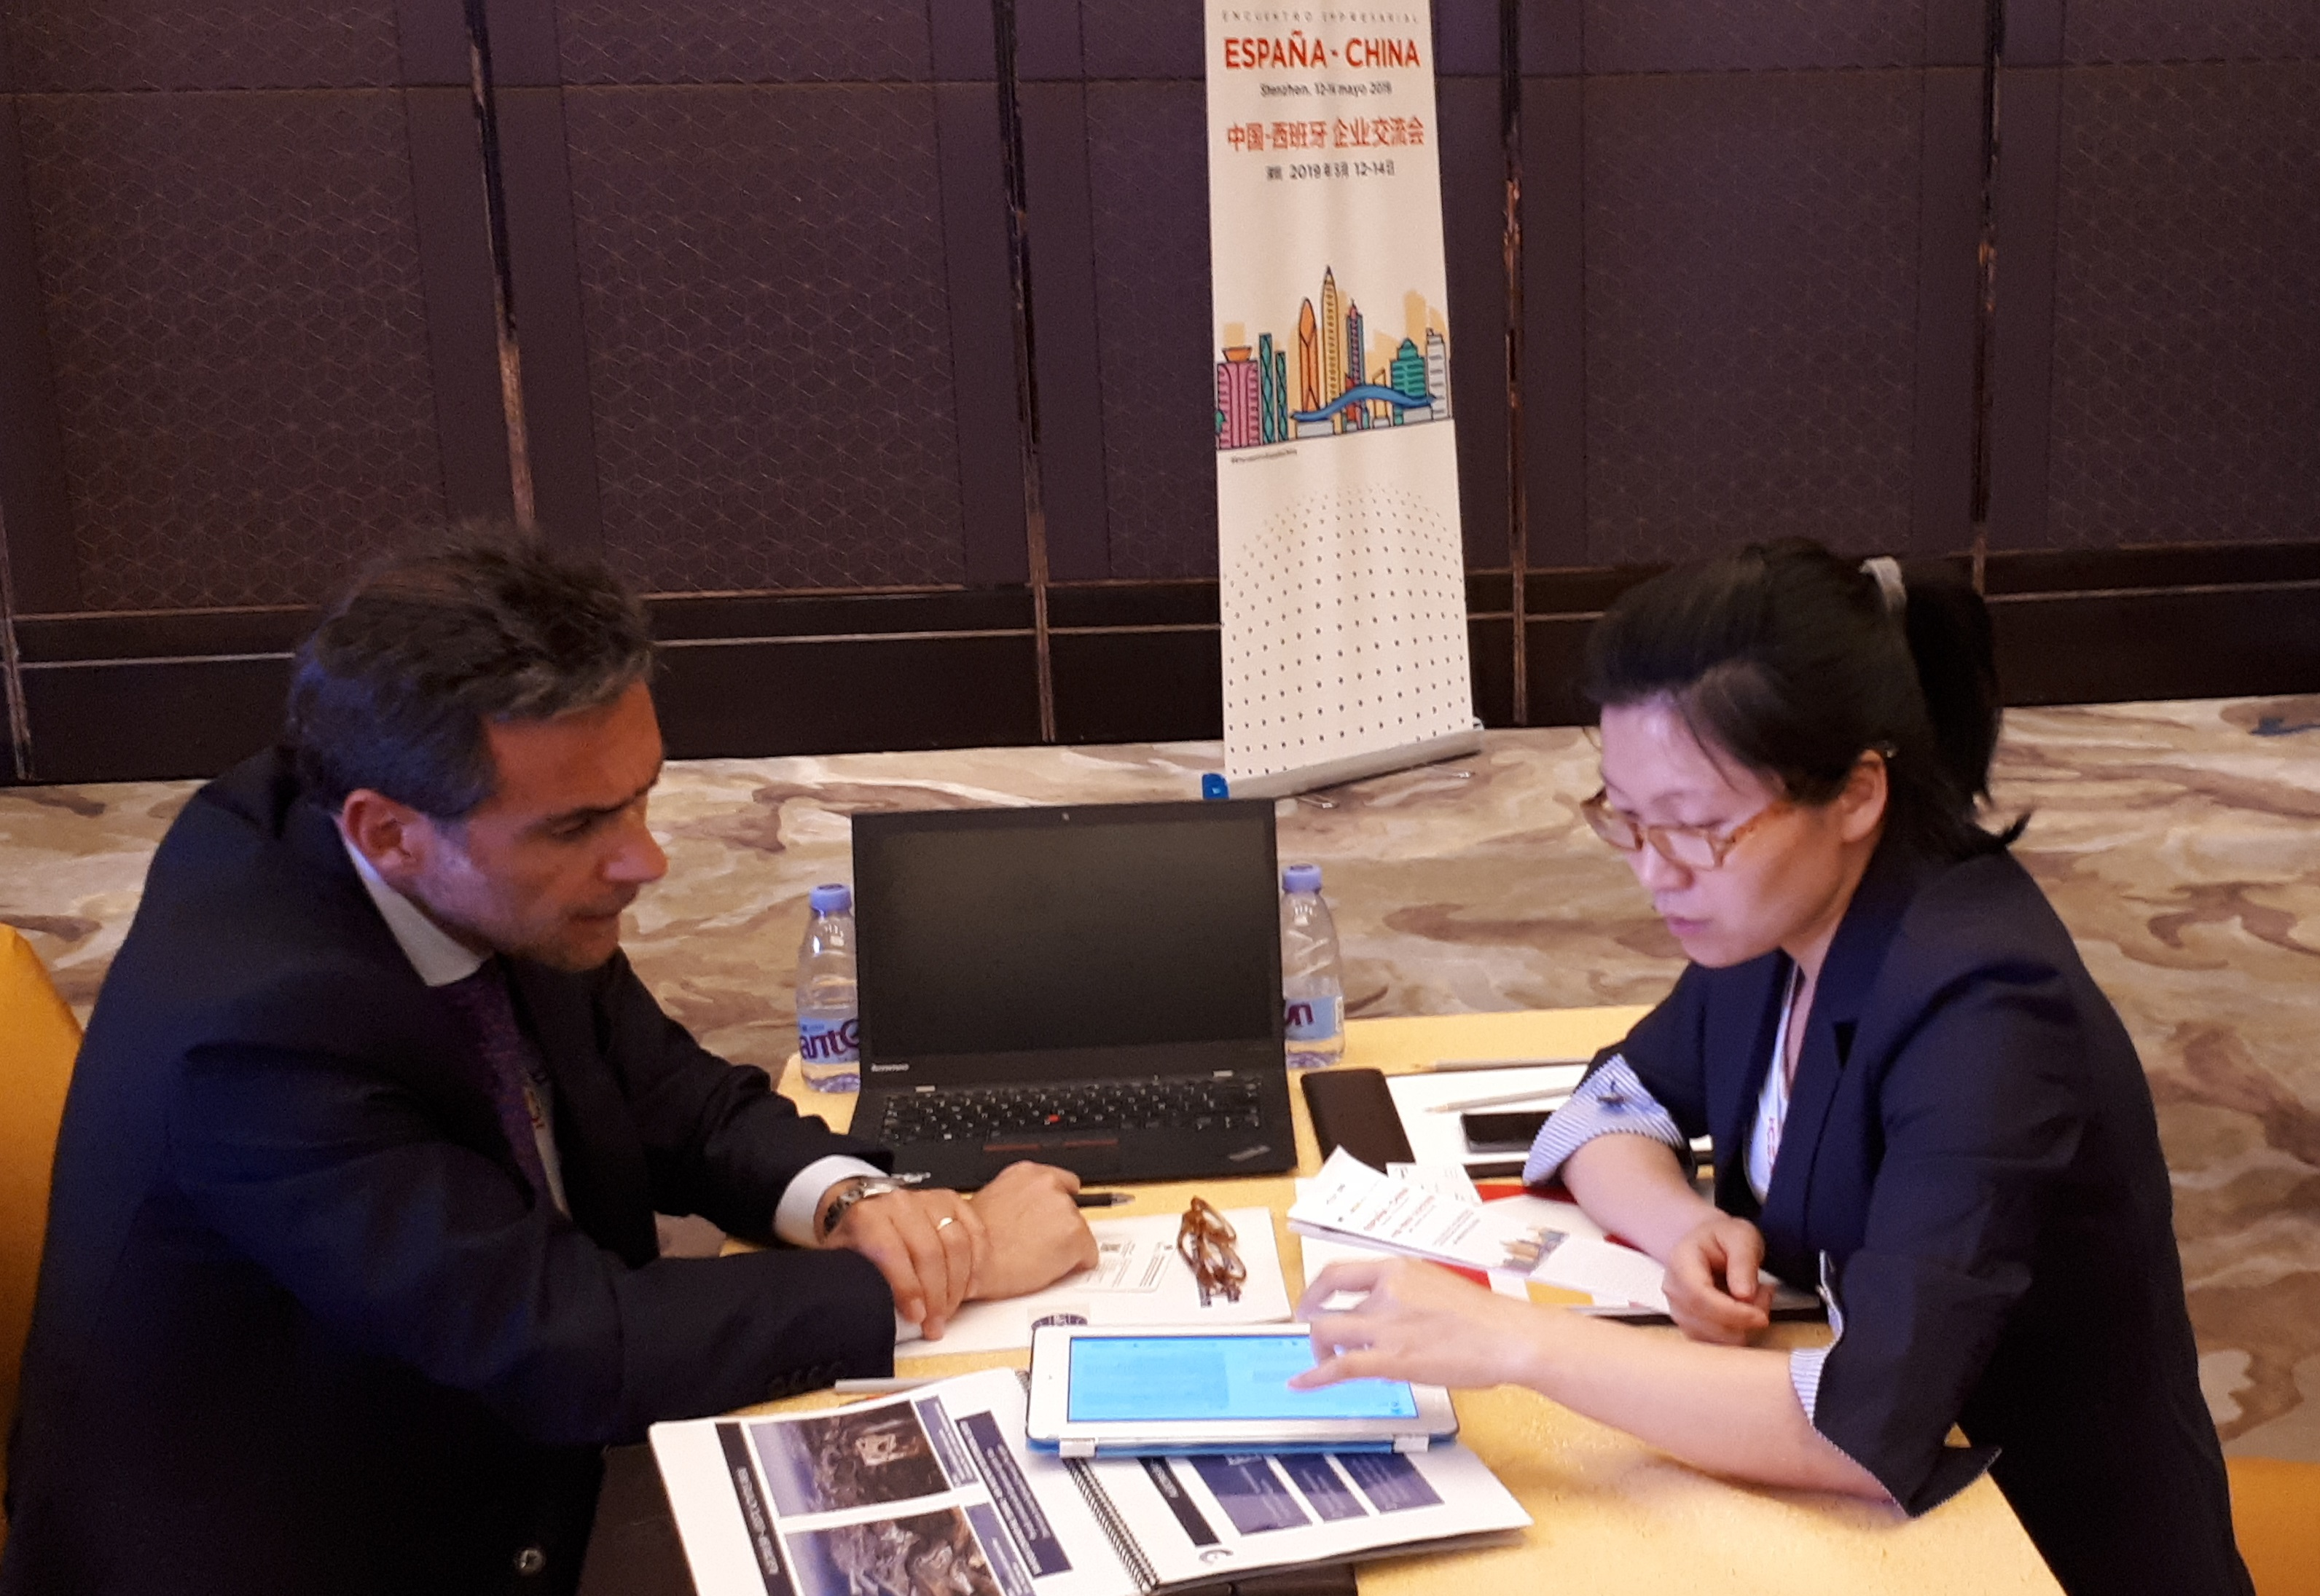 Encuentros B2B España-China 2